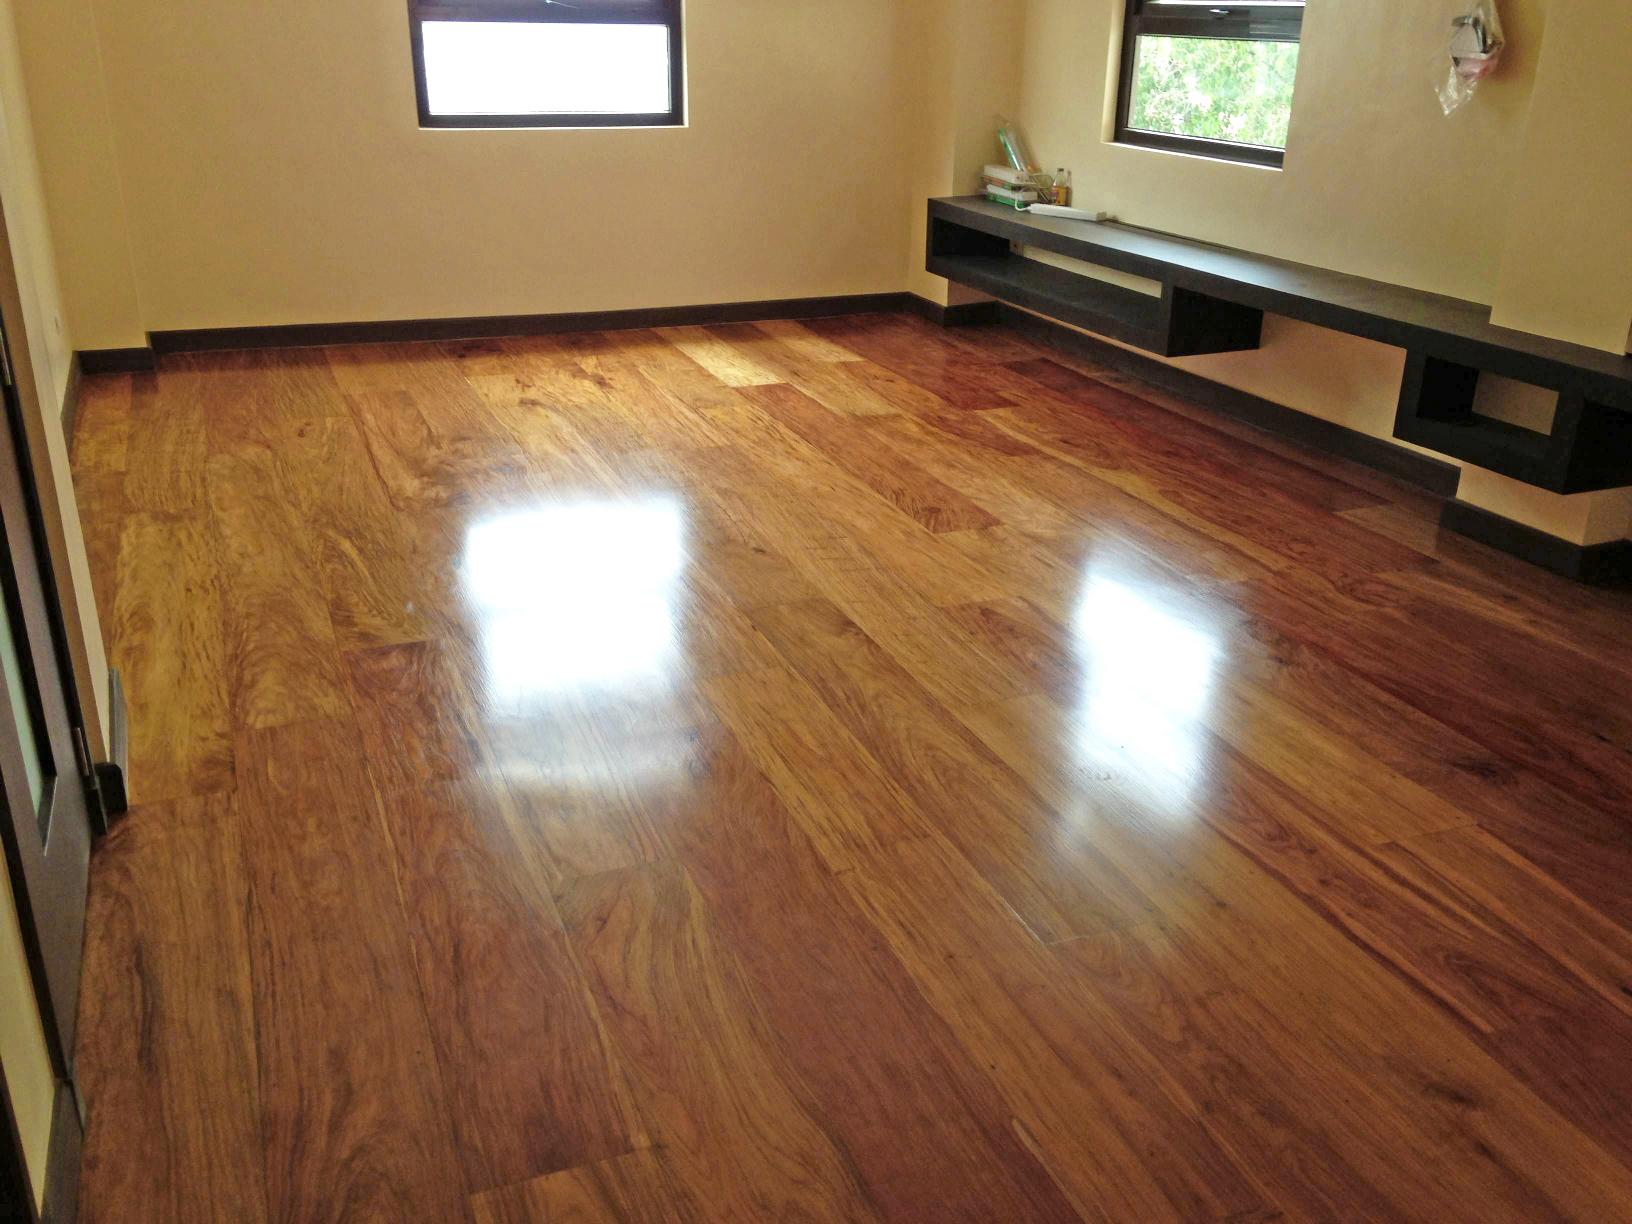 Wood parquet floor tiles philippines carpet vidalondon narra solid wood flooring wood parquet flooring philippines dailygadgetfo Choice Image